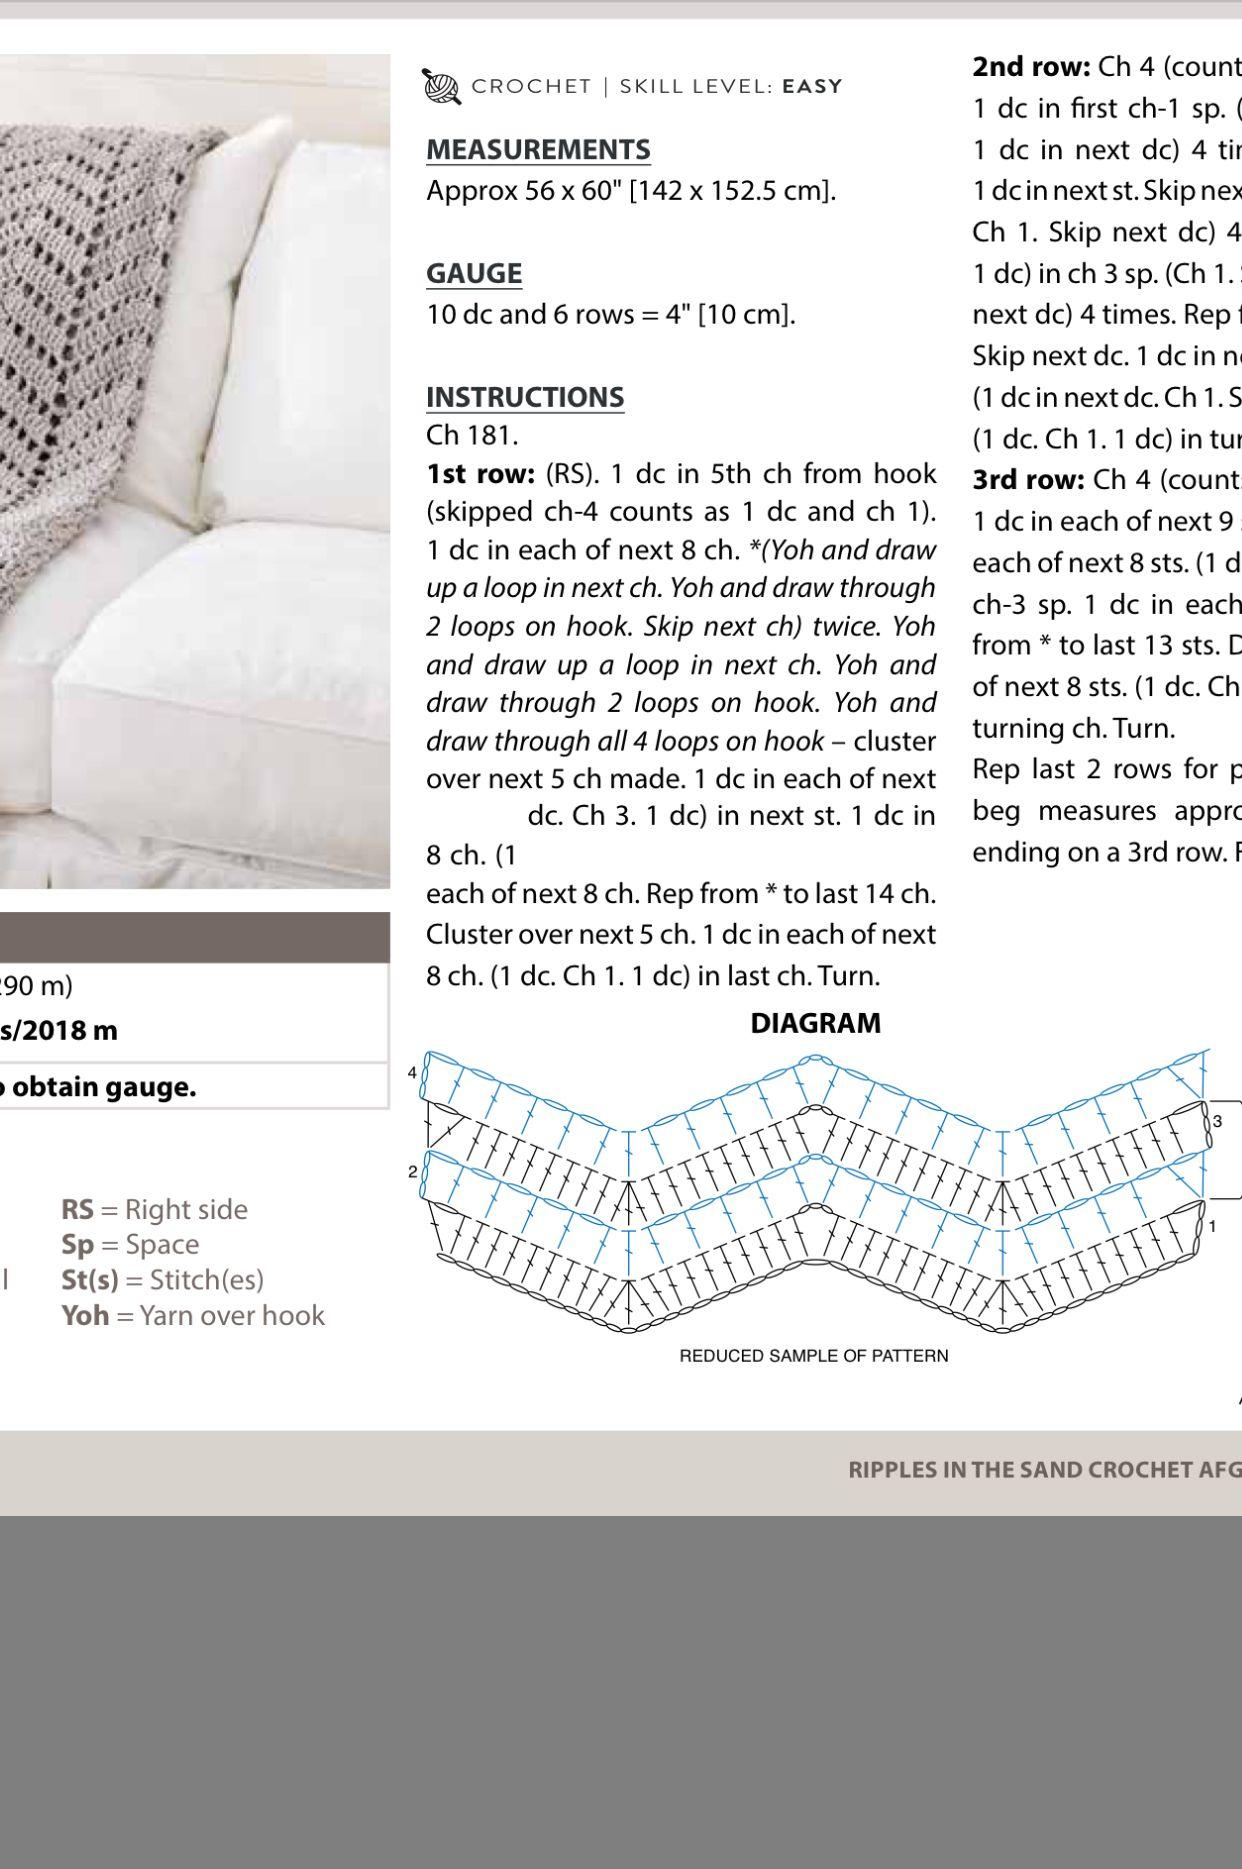 Pin By Joni Hanks On Crochet Crochet Site Master